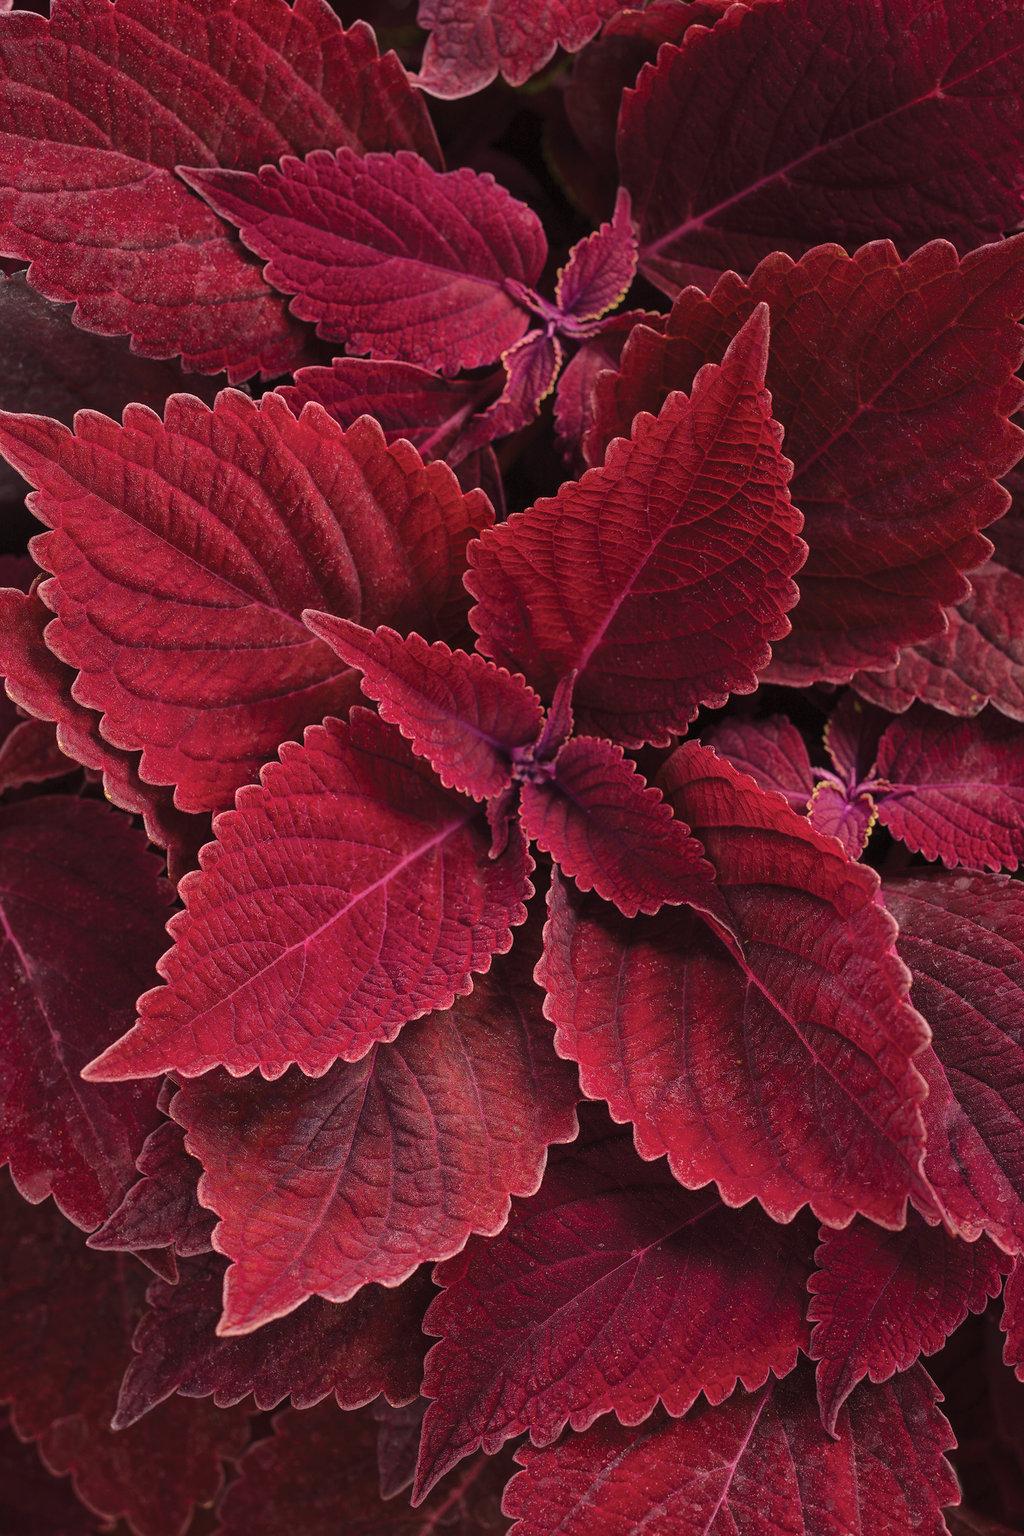 ColorBlaze® Rediculous™ - Coleus - Solenostemon ... on red foliage flowers, red foliage bushes, red foliage grasses, red foliage annuals, red foliage hibiscus, common indoor houseplants, red foliage plants, red and green houseplants, red foliage perennials, red flowering houseplants, red foliage vines,